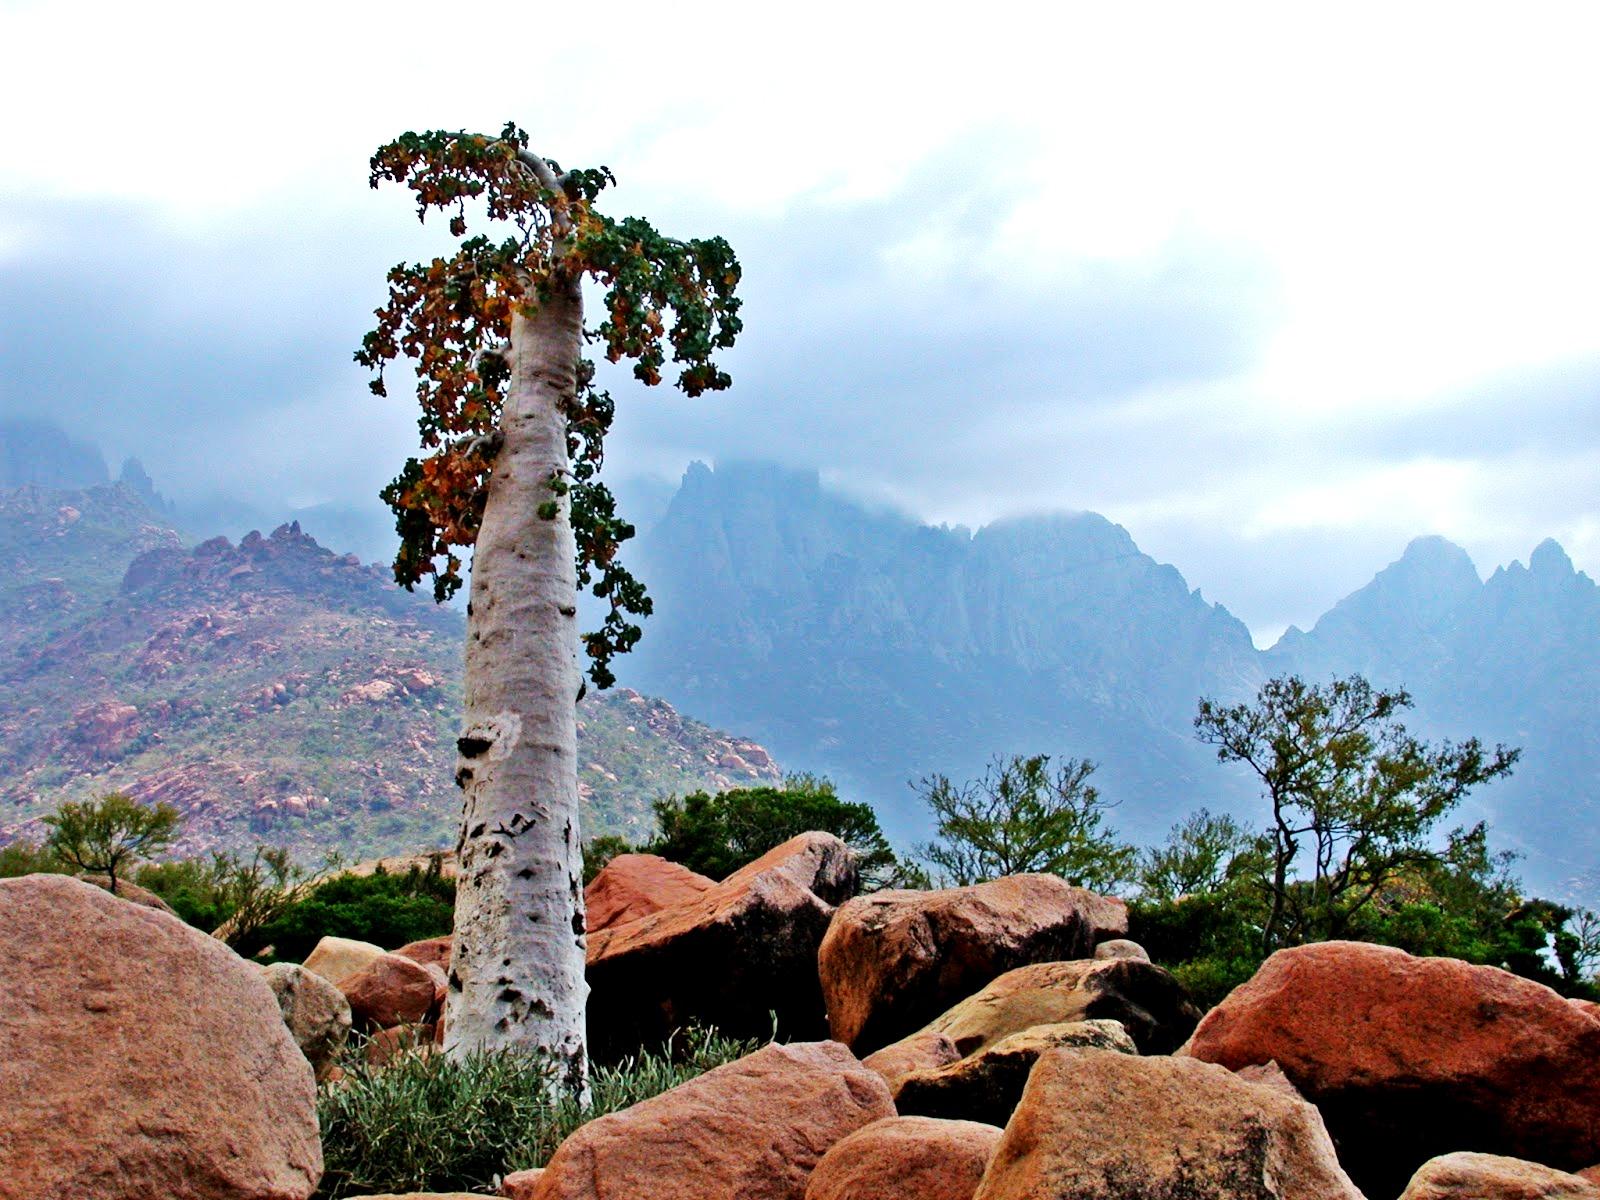 дерево с огурцами